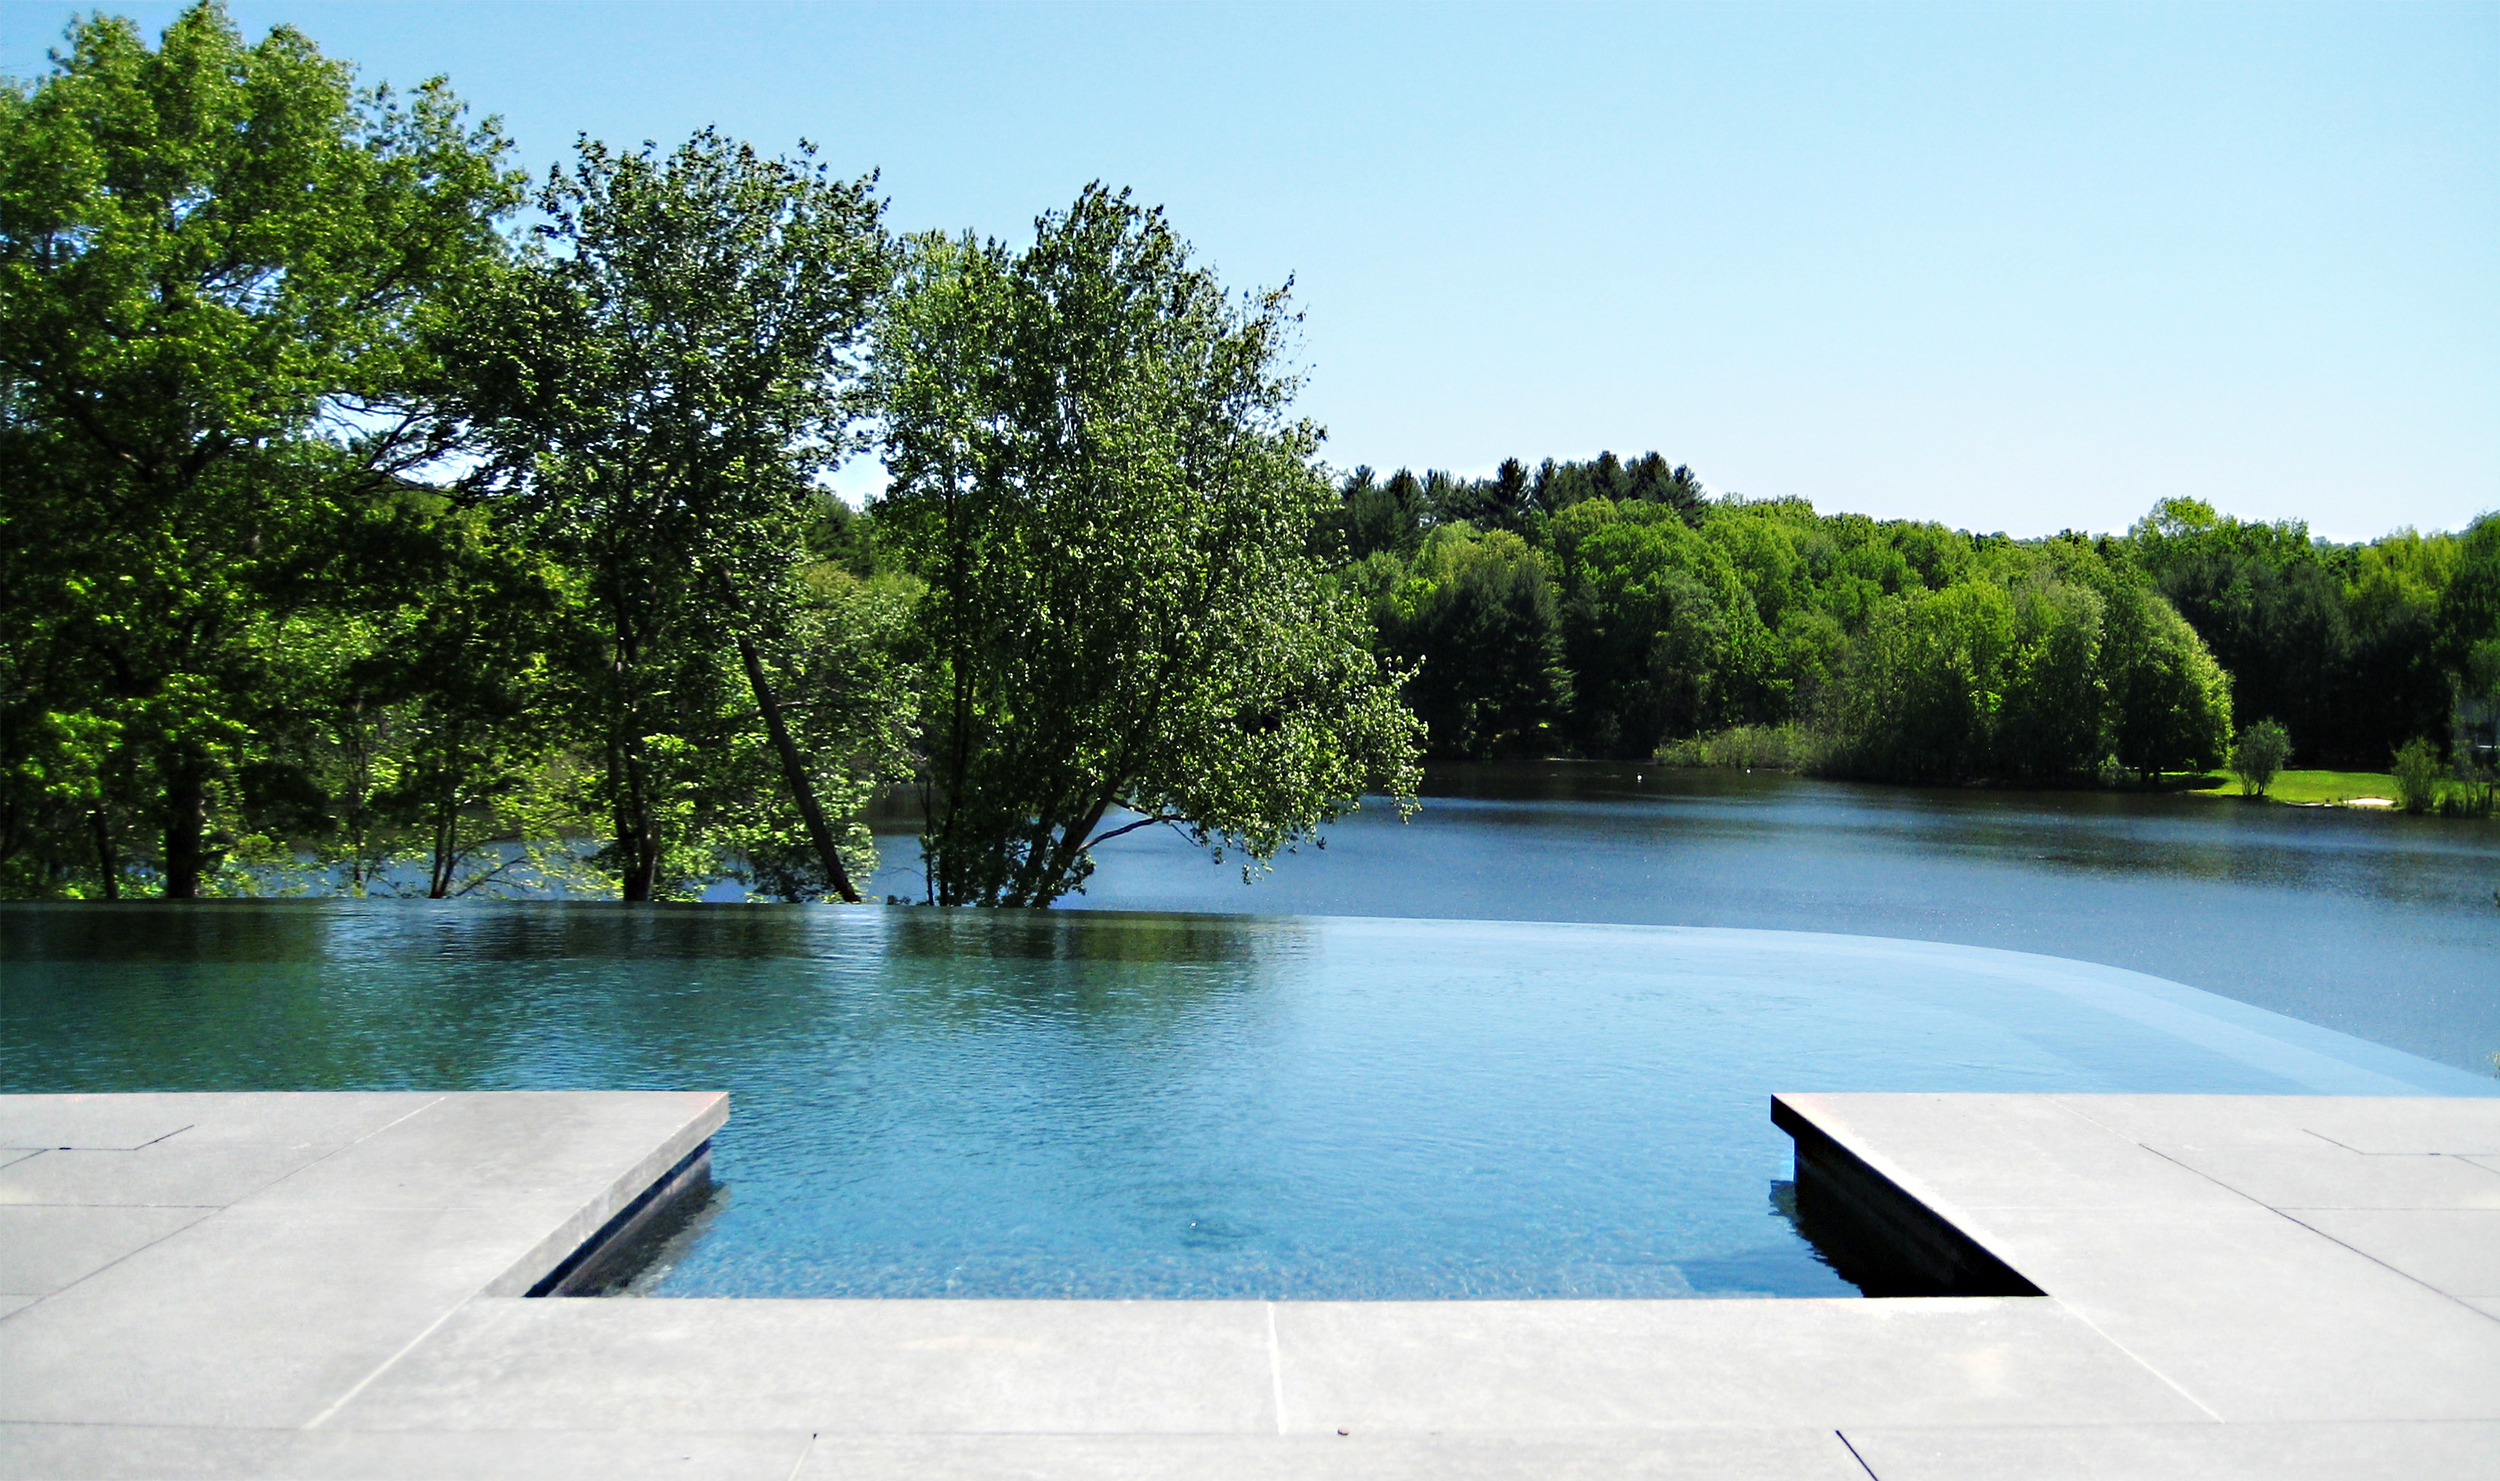 Friedman_house_04 pool view.jpg